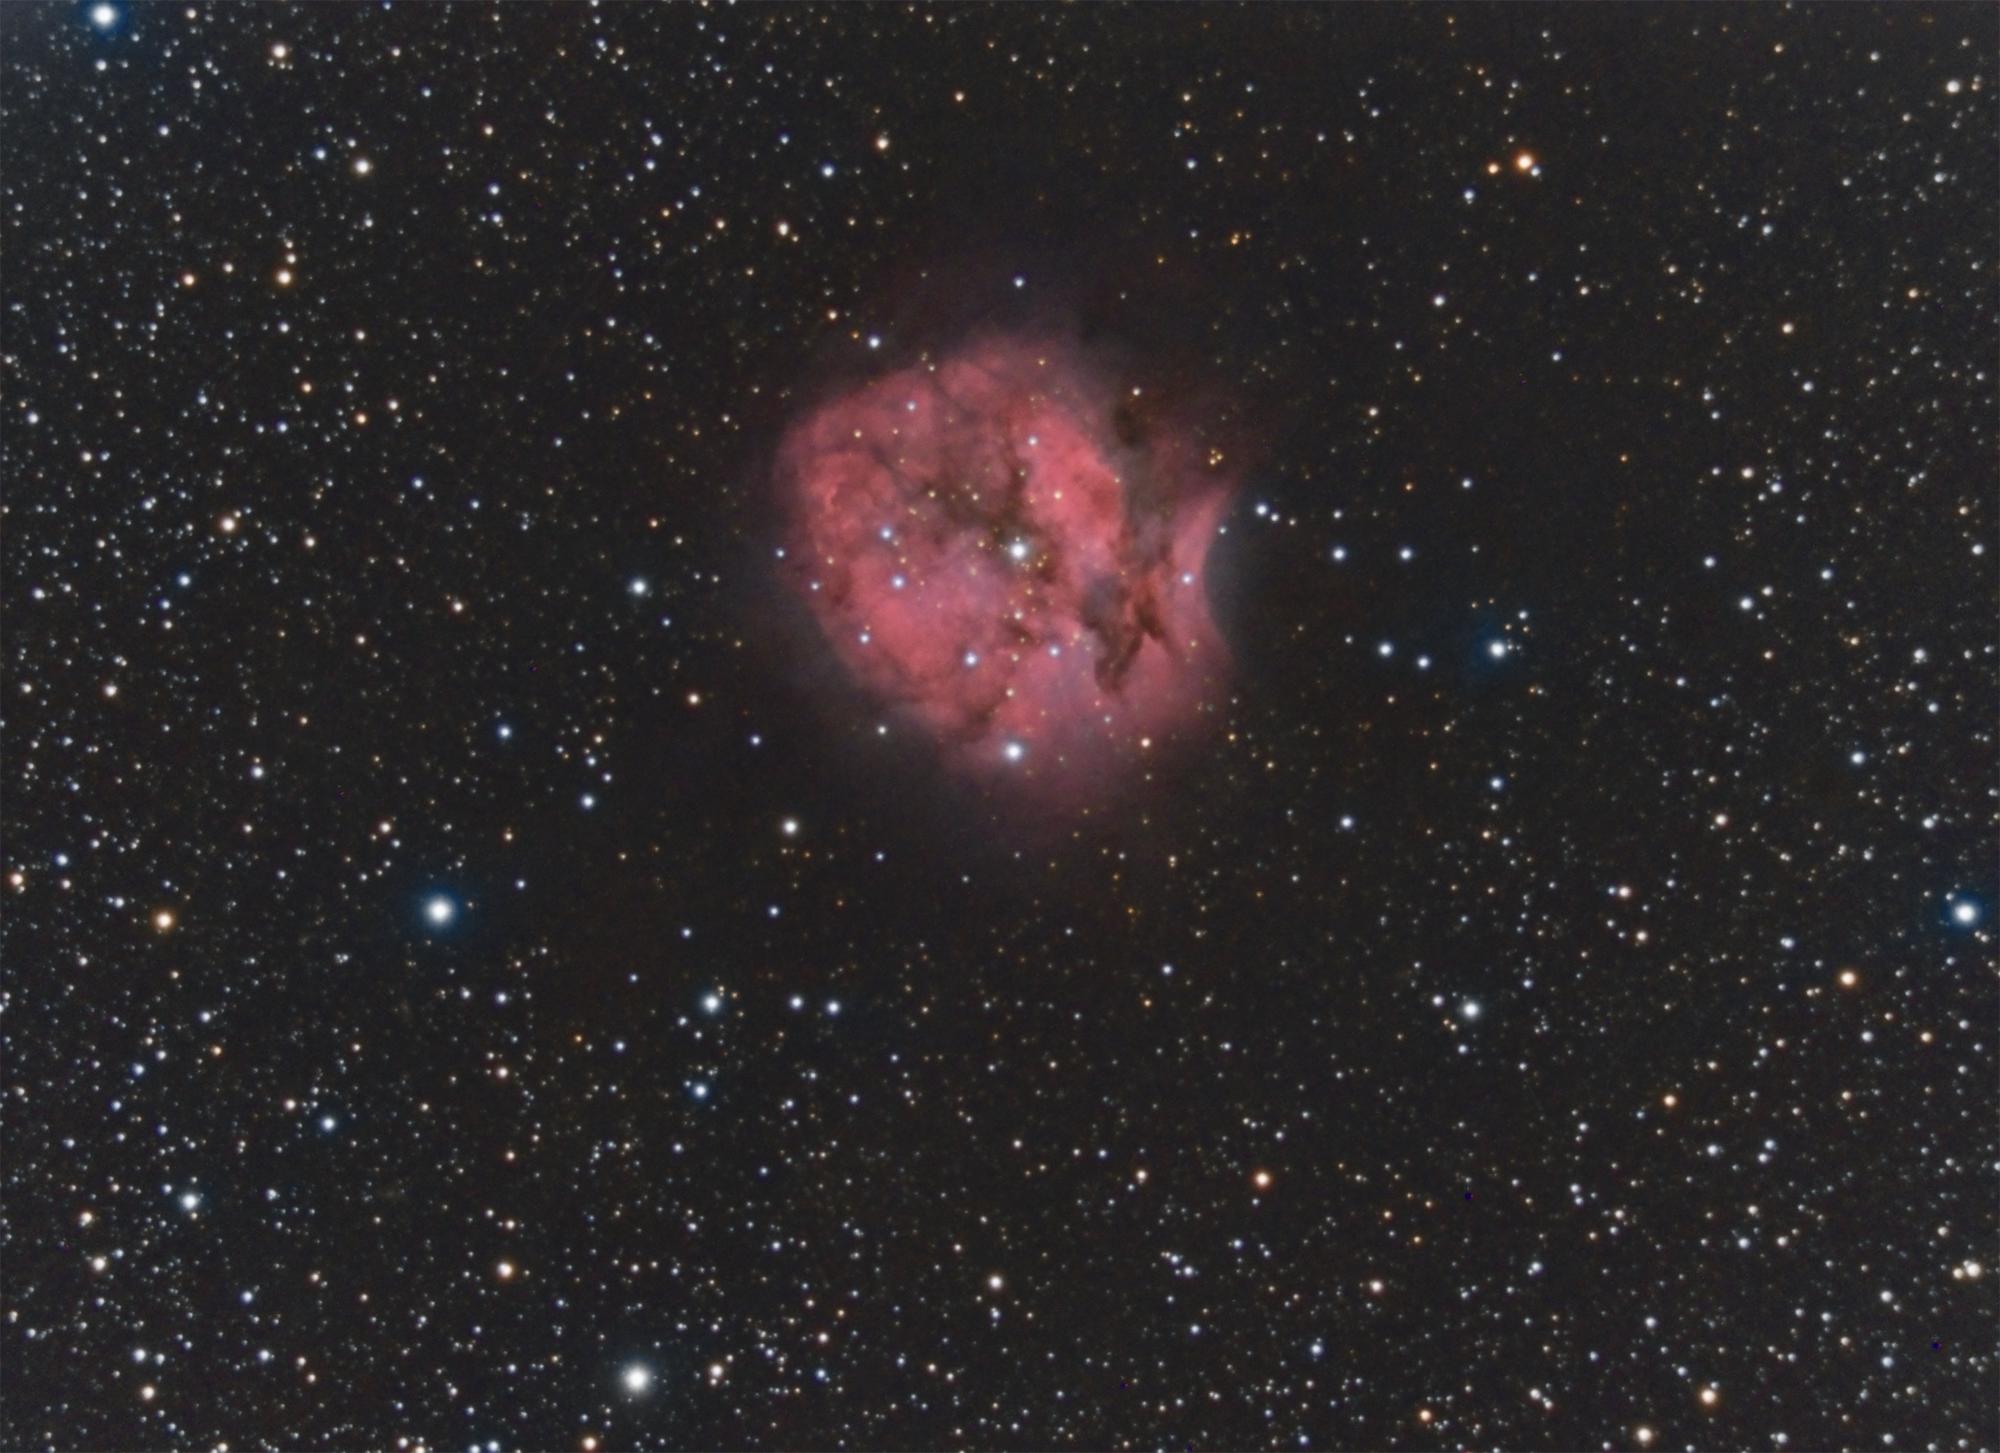 étoile wolf rayet